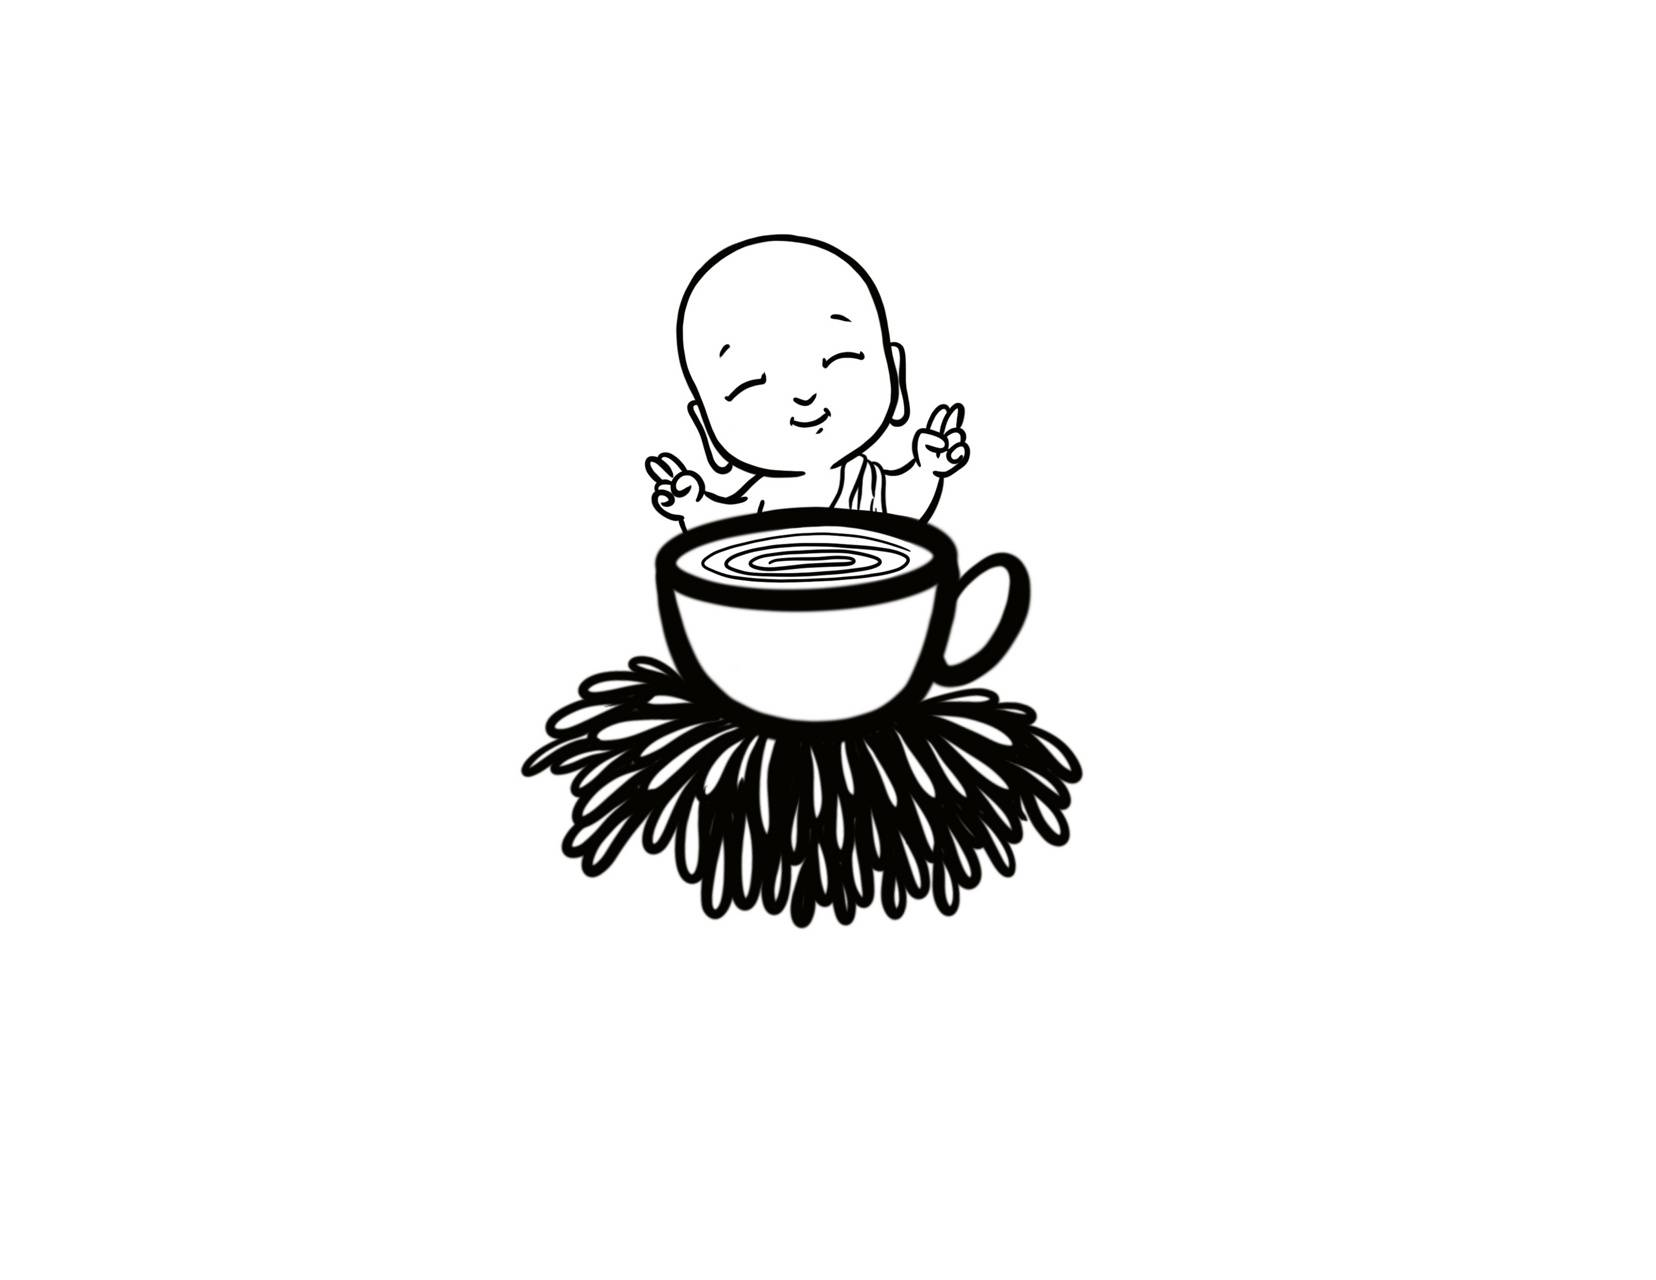 Peaceful Coffee time